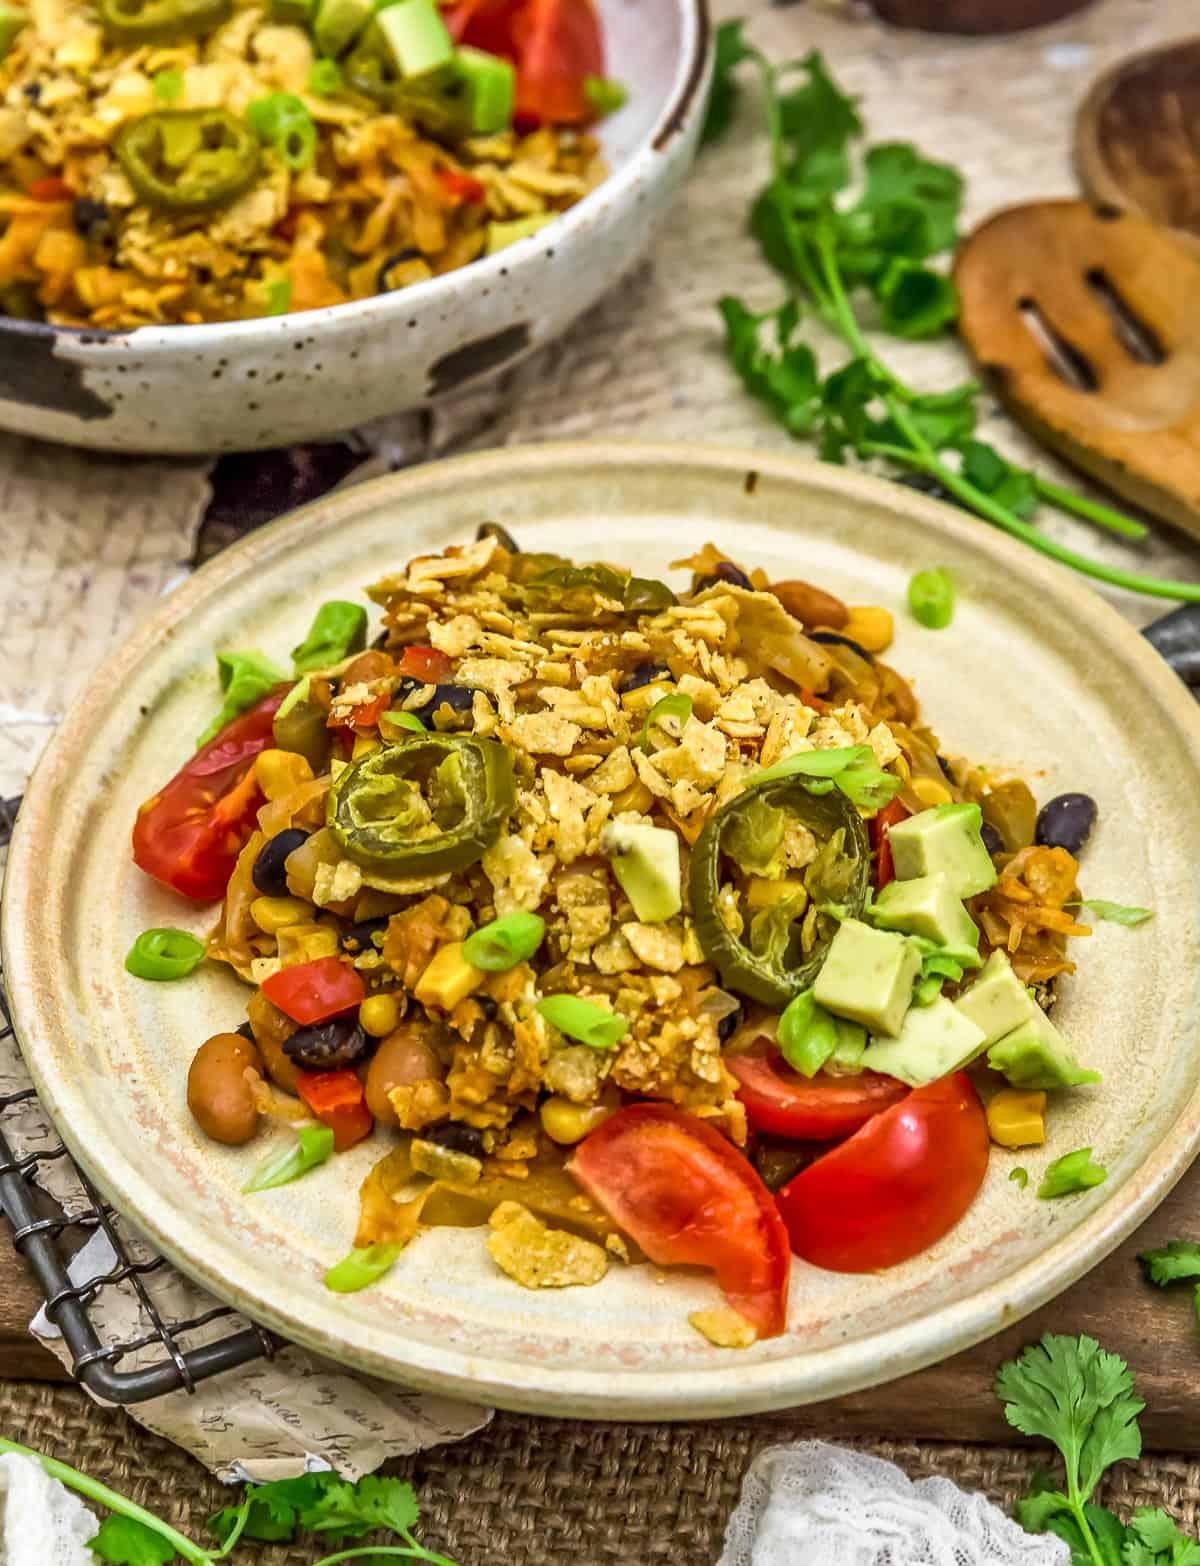 Served Vegan Tex-Mex Cabbage Casserole